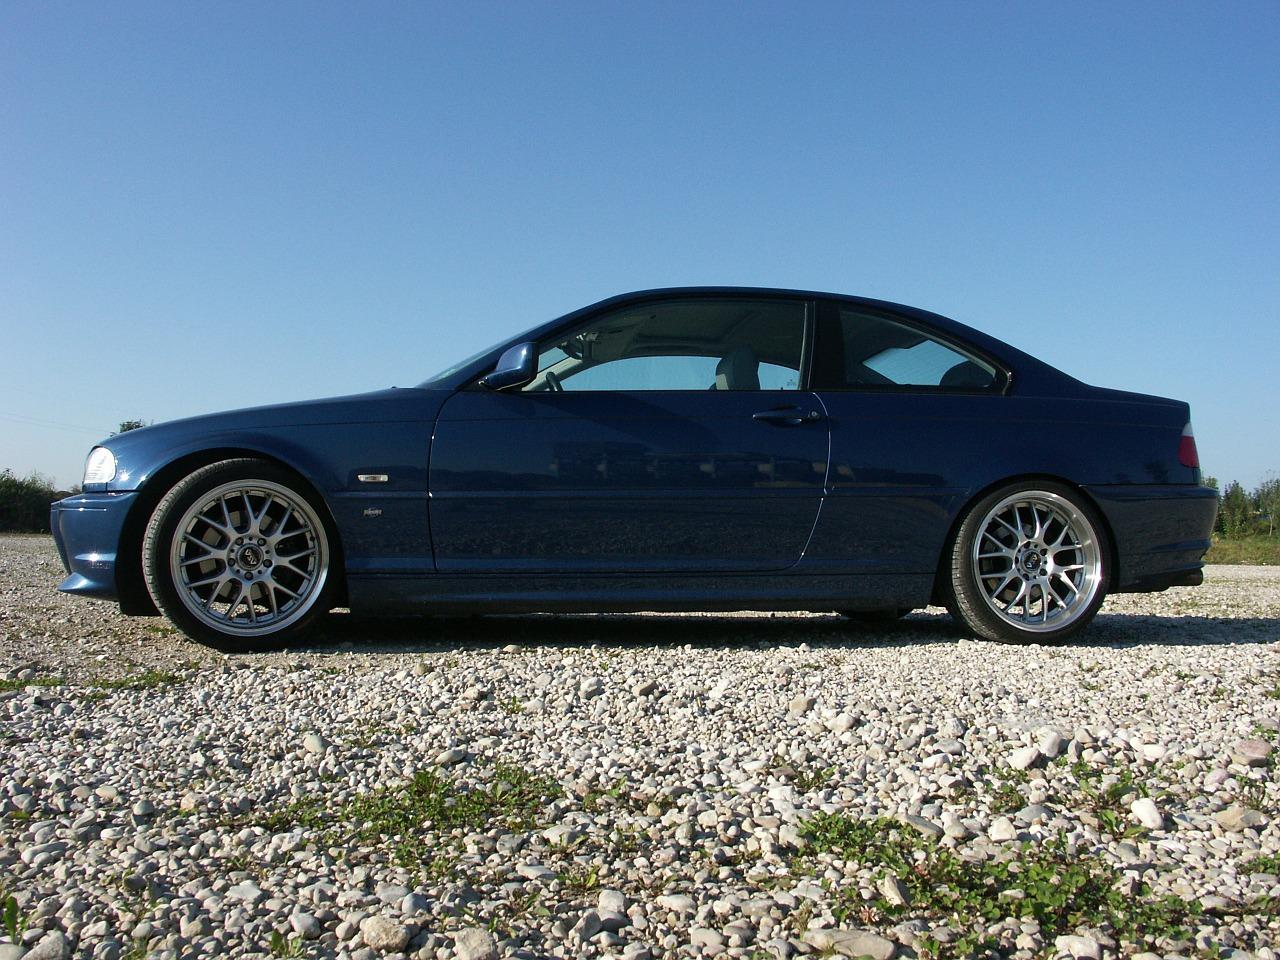 BMW Coupe - einzigartige Fahrerlebnis